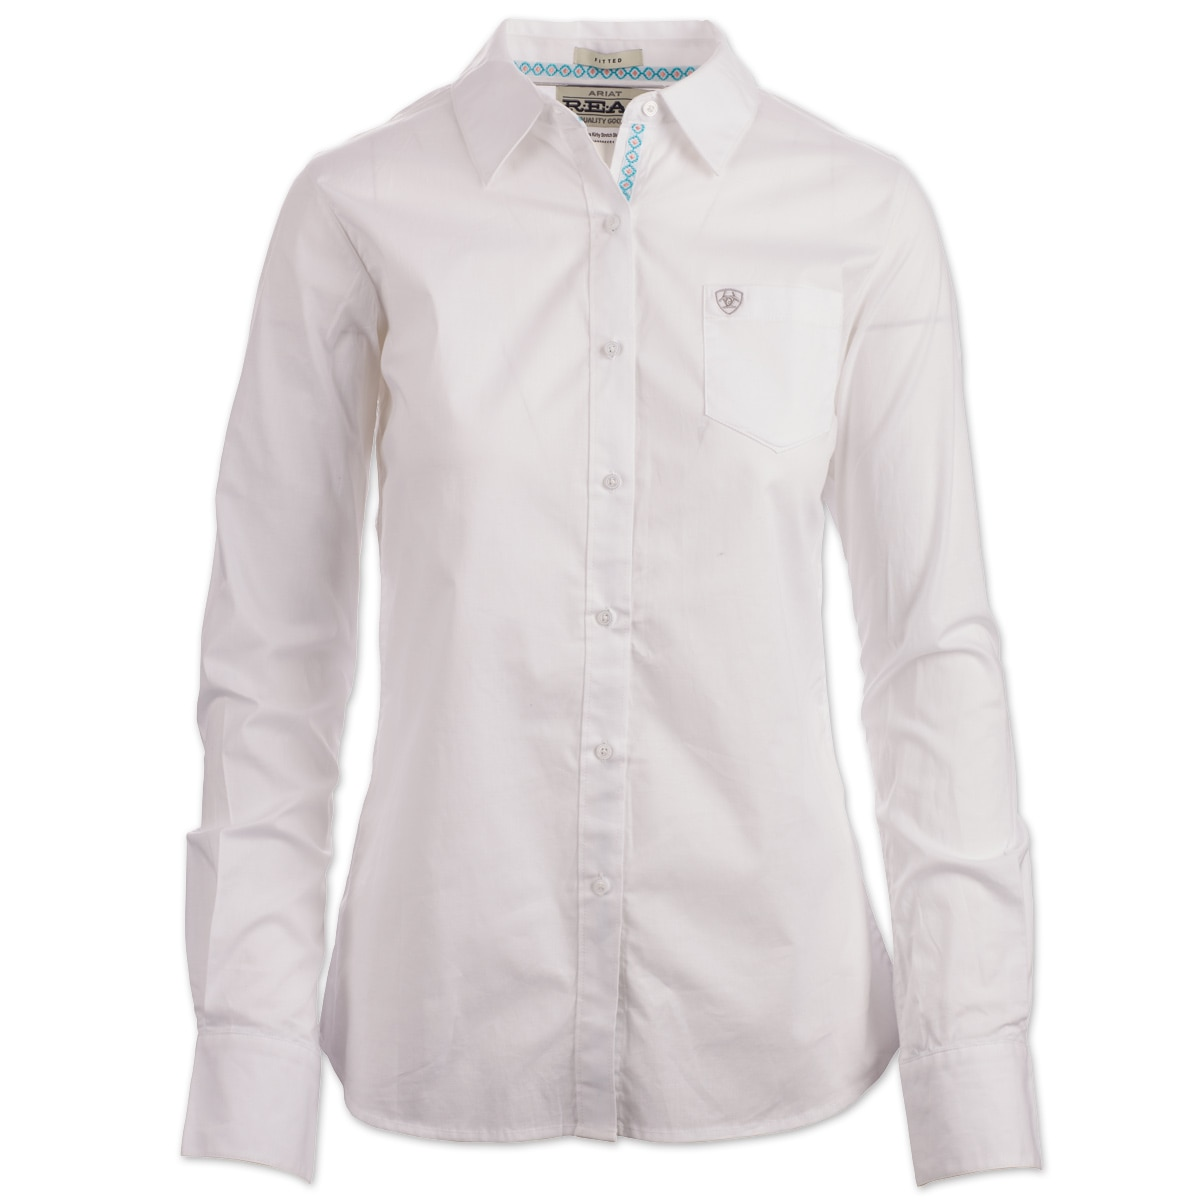 Ariat Women's R.E.A.L Kirby Stretch Shirt